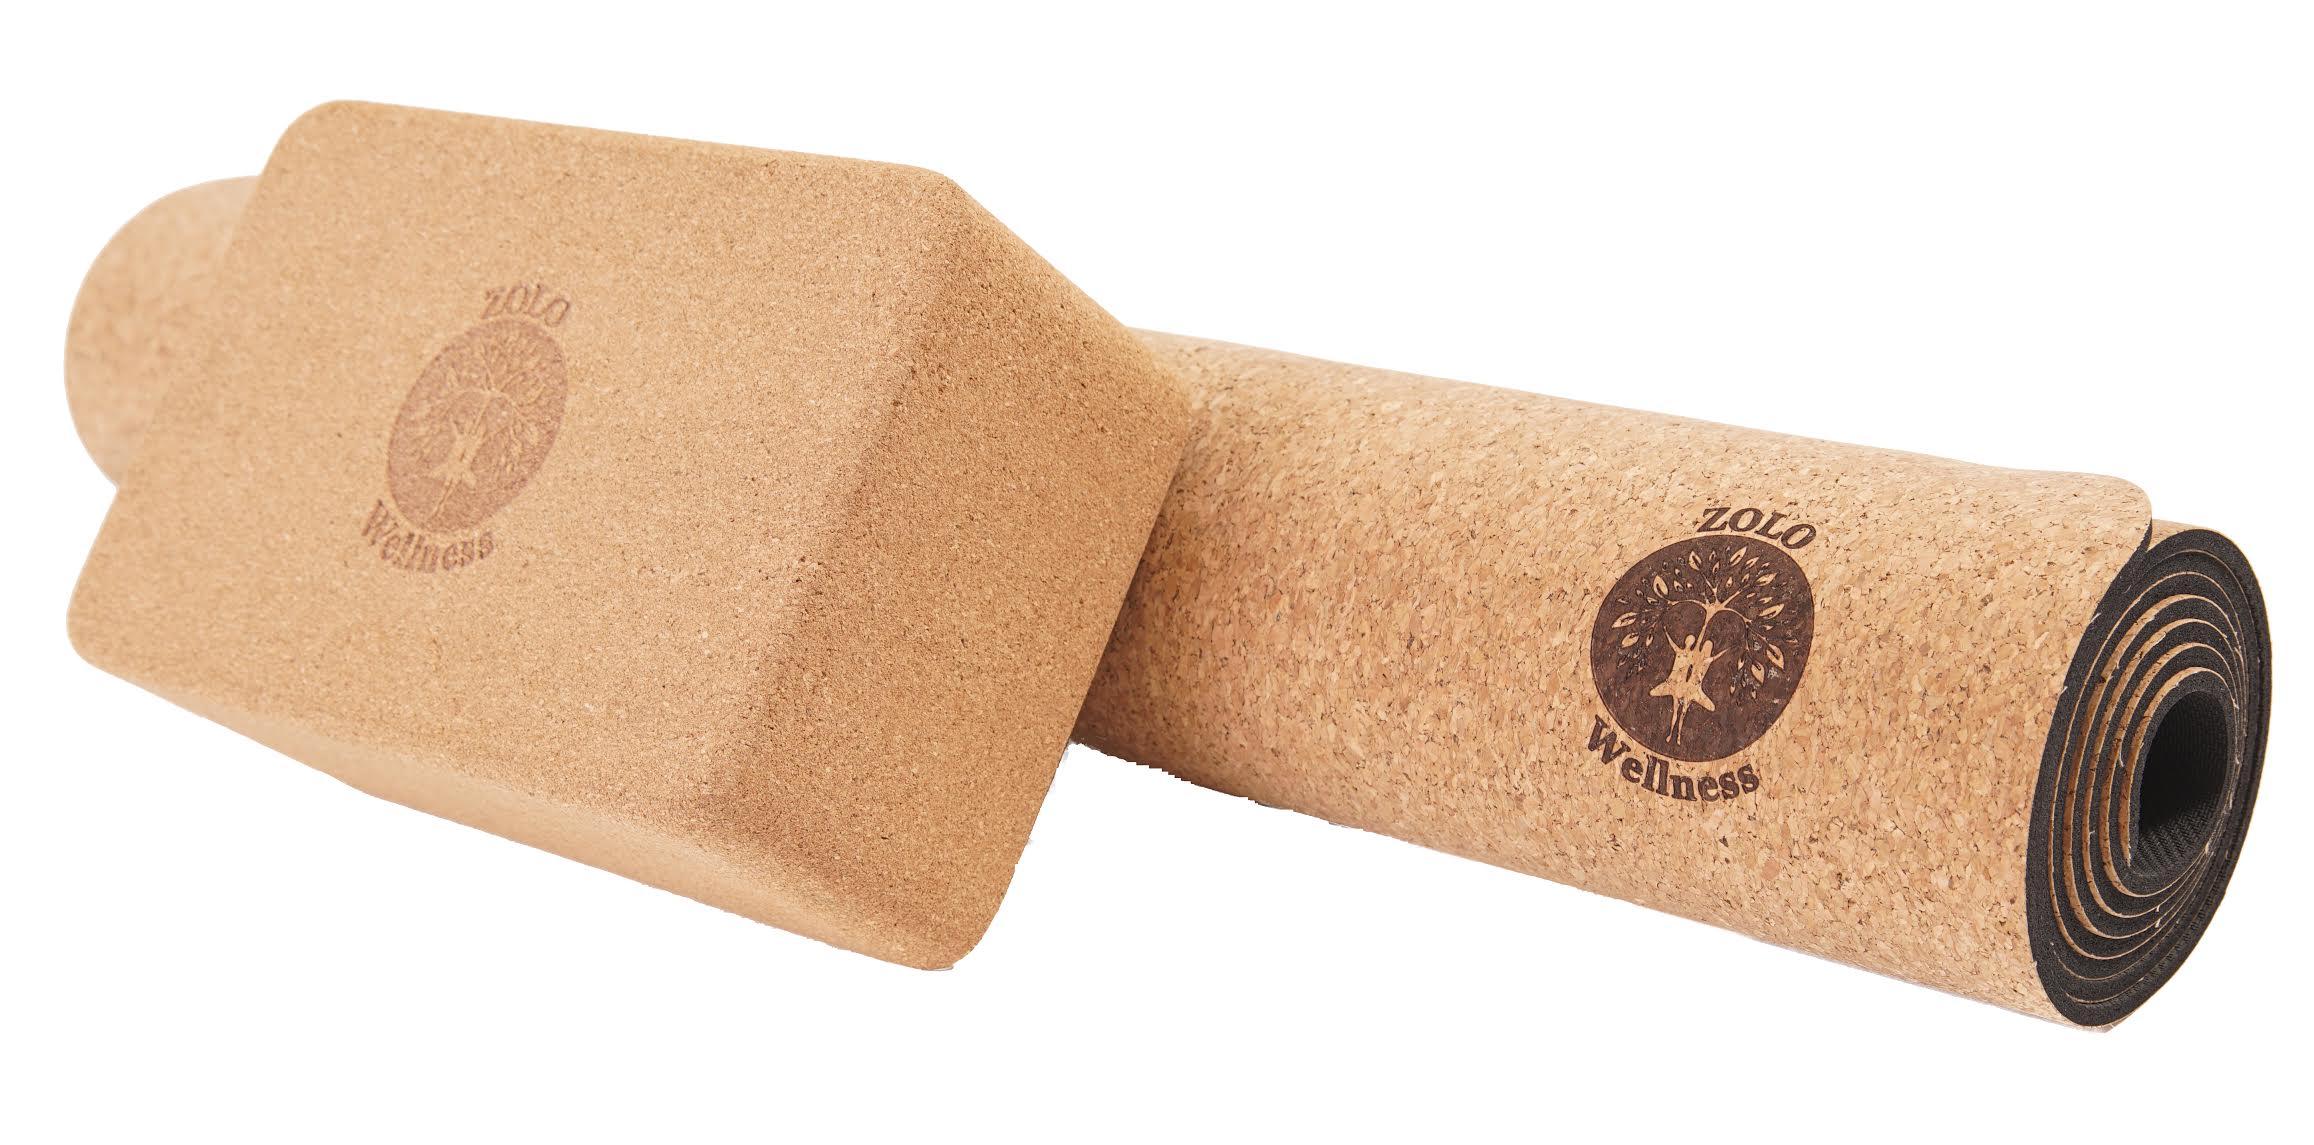 ab cork gym yoga mirafit mat mandala sentinel fitness non mats natural printed slip exercise pilates floor itm